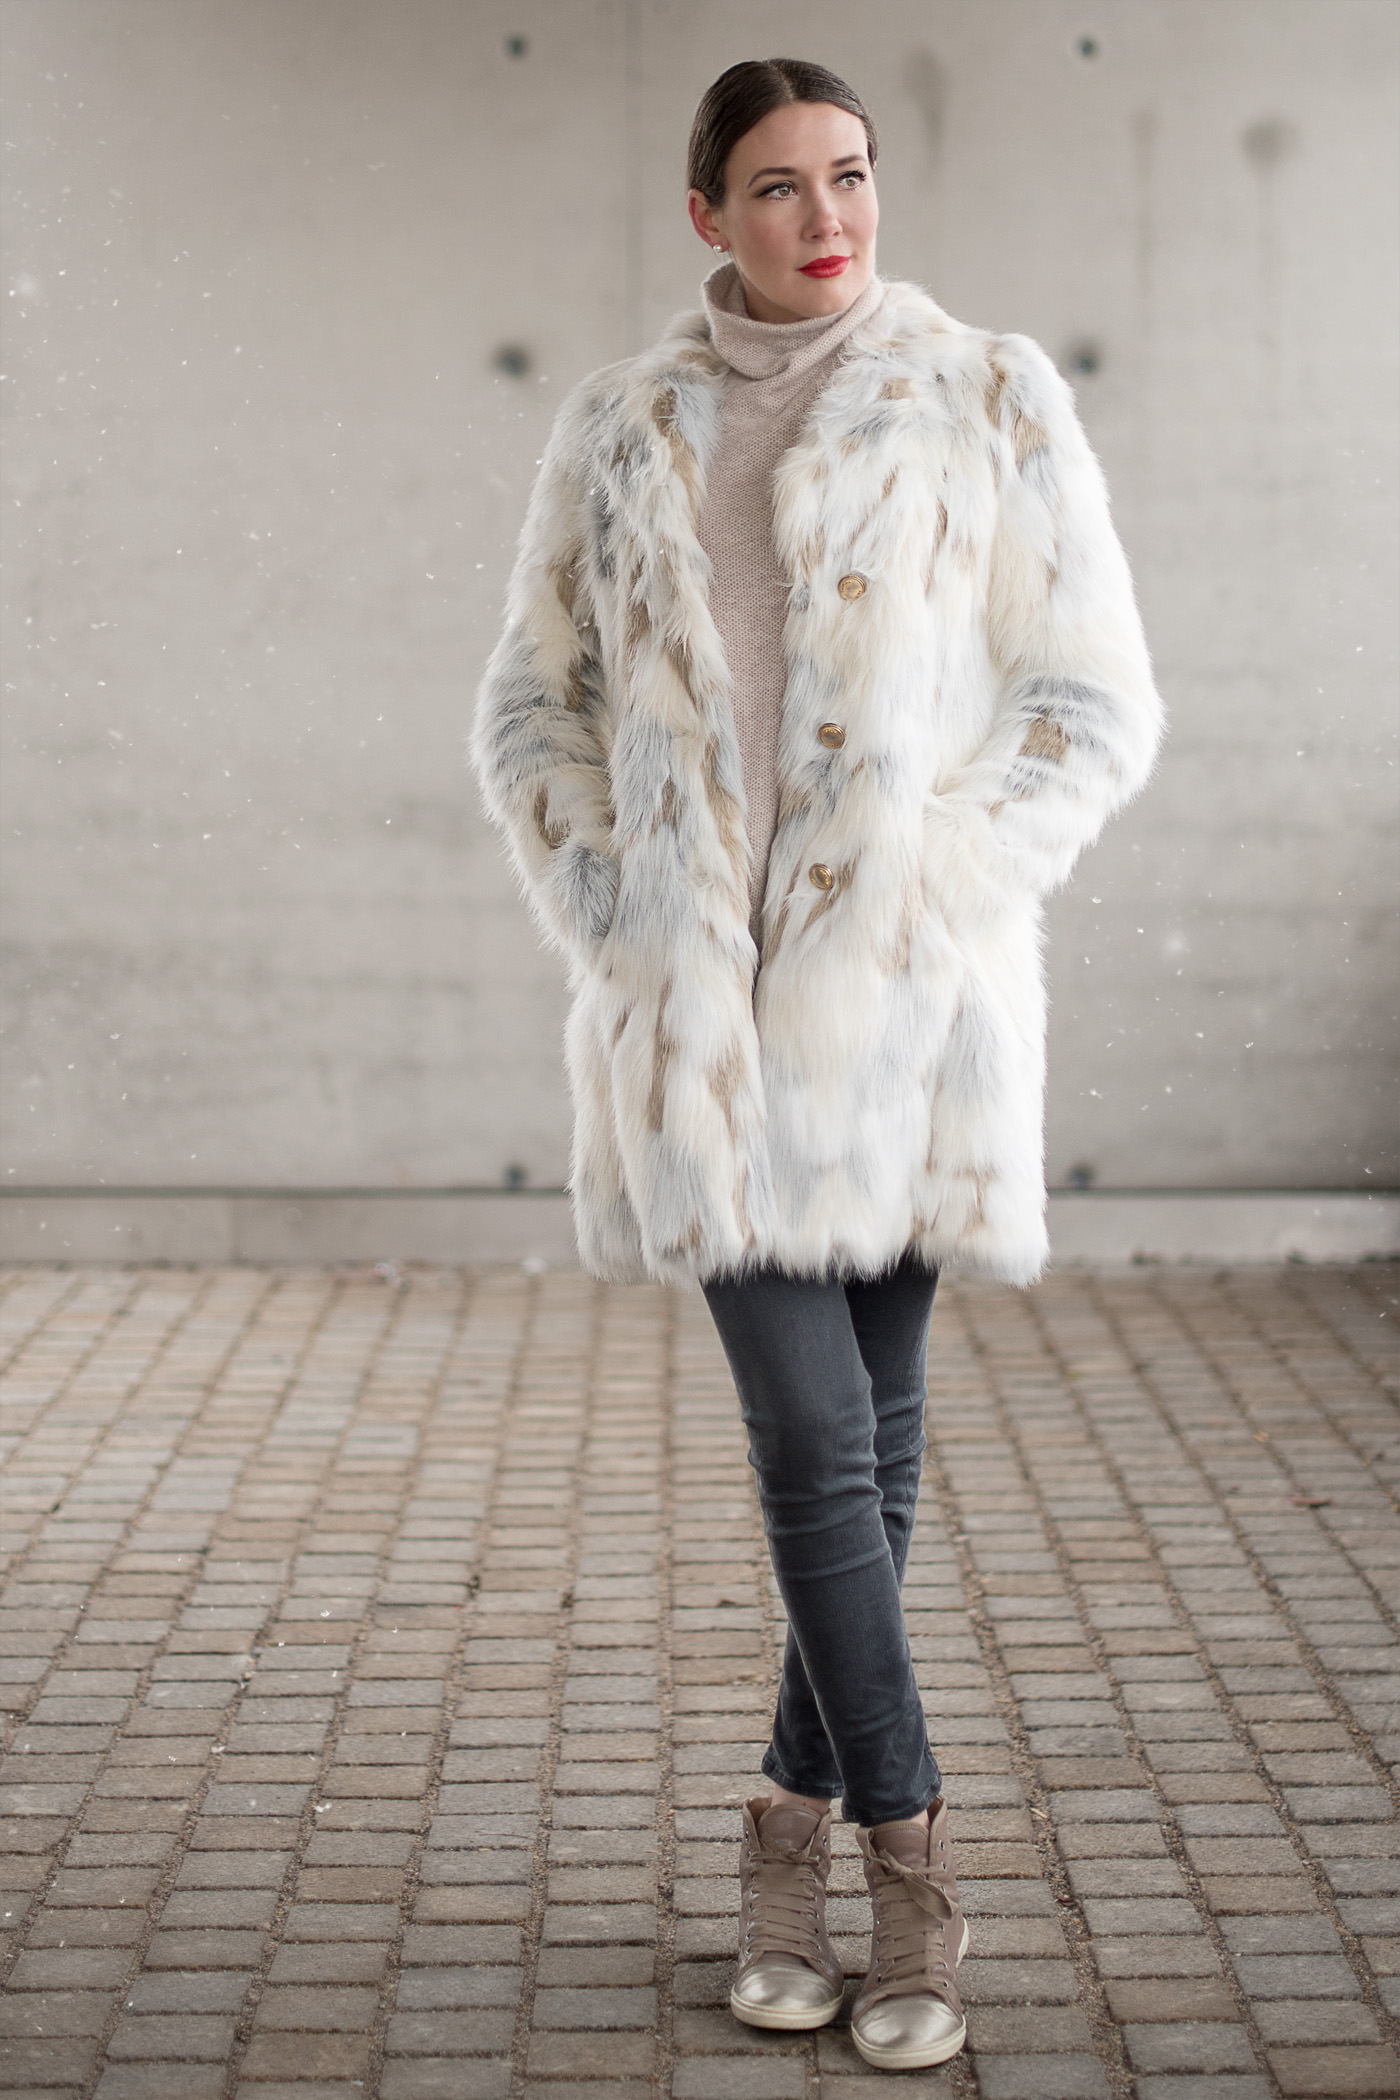 patrizia pepe zara lanvin fake fur mrs and hugs. Black Bedroom Furniture Sets. Home Design Ideas